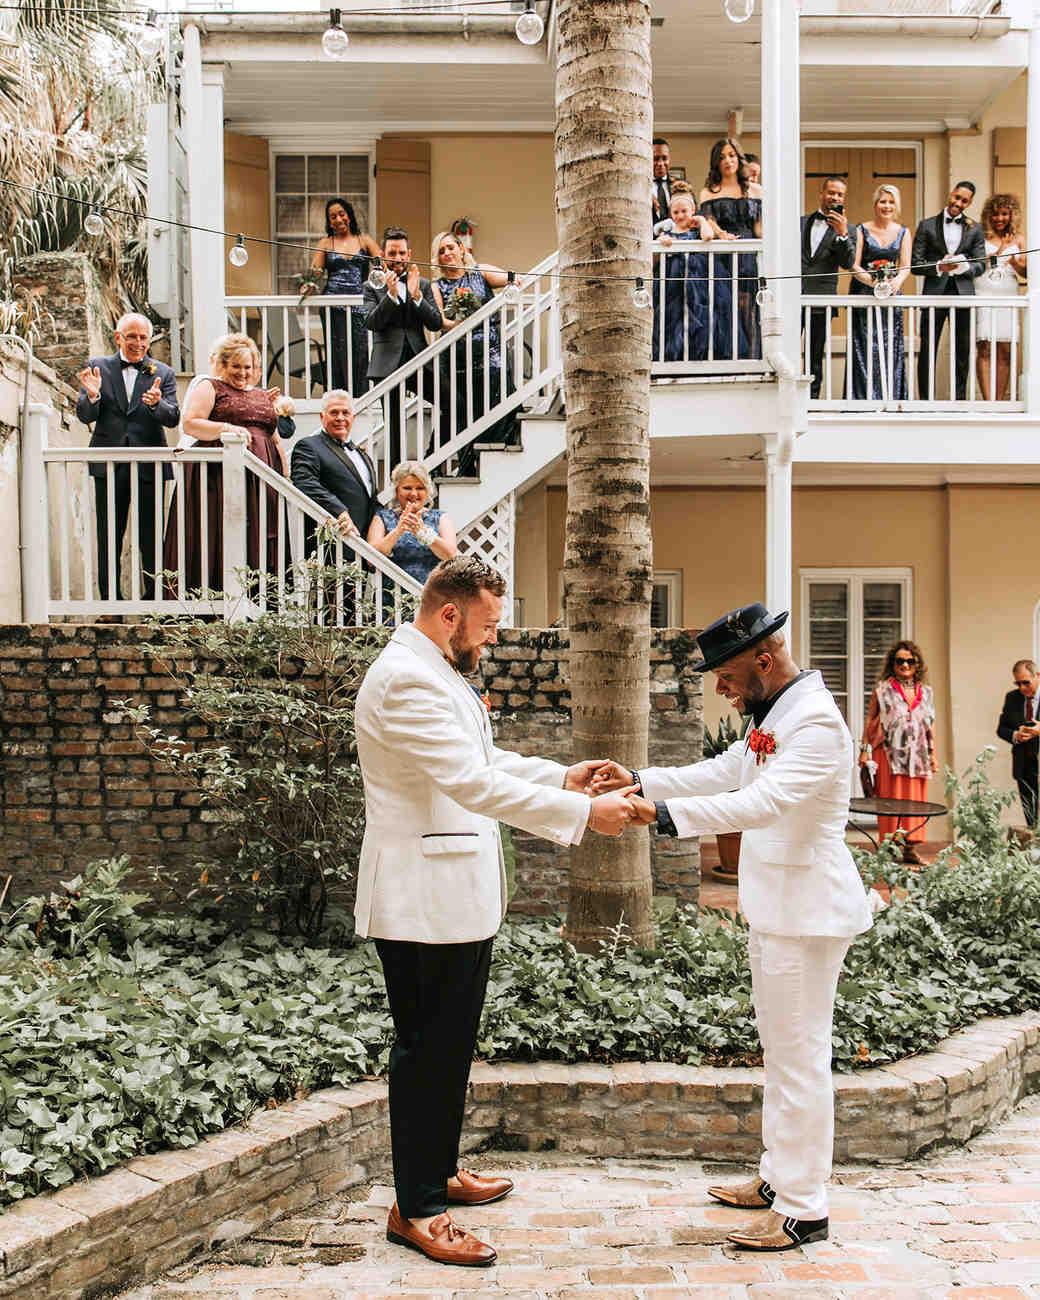 joe-tim-wedding-firstlook-0424-1018_vert.jpg